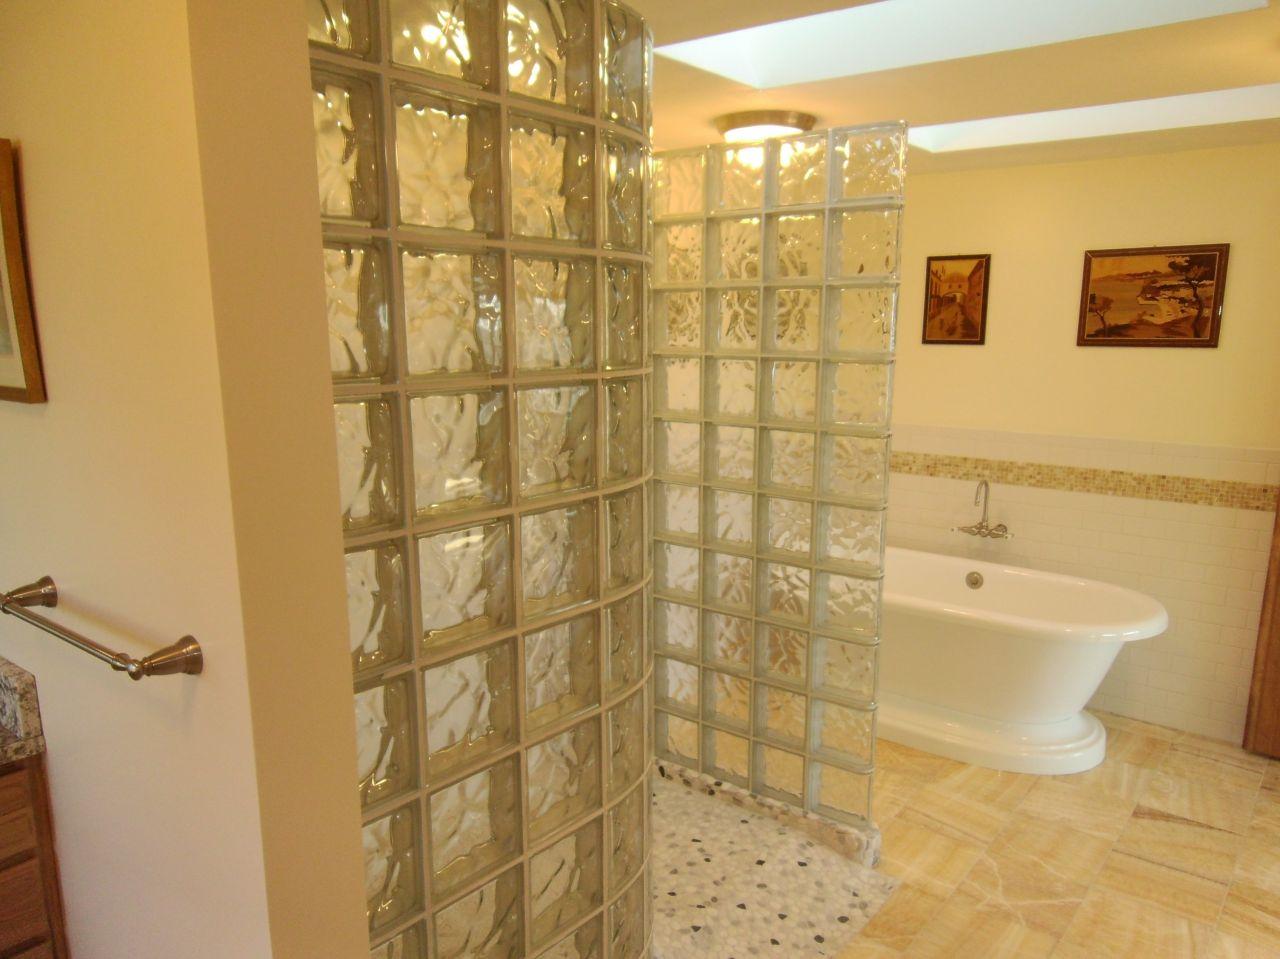 Best Kitchen Gallery: Remodeling Space Over A Garage Larger Master Bathroom New Harbor Maine of Glass Block Bathroom Designs  on rachelxblog.com